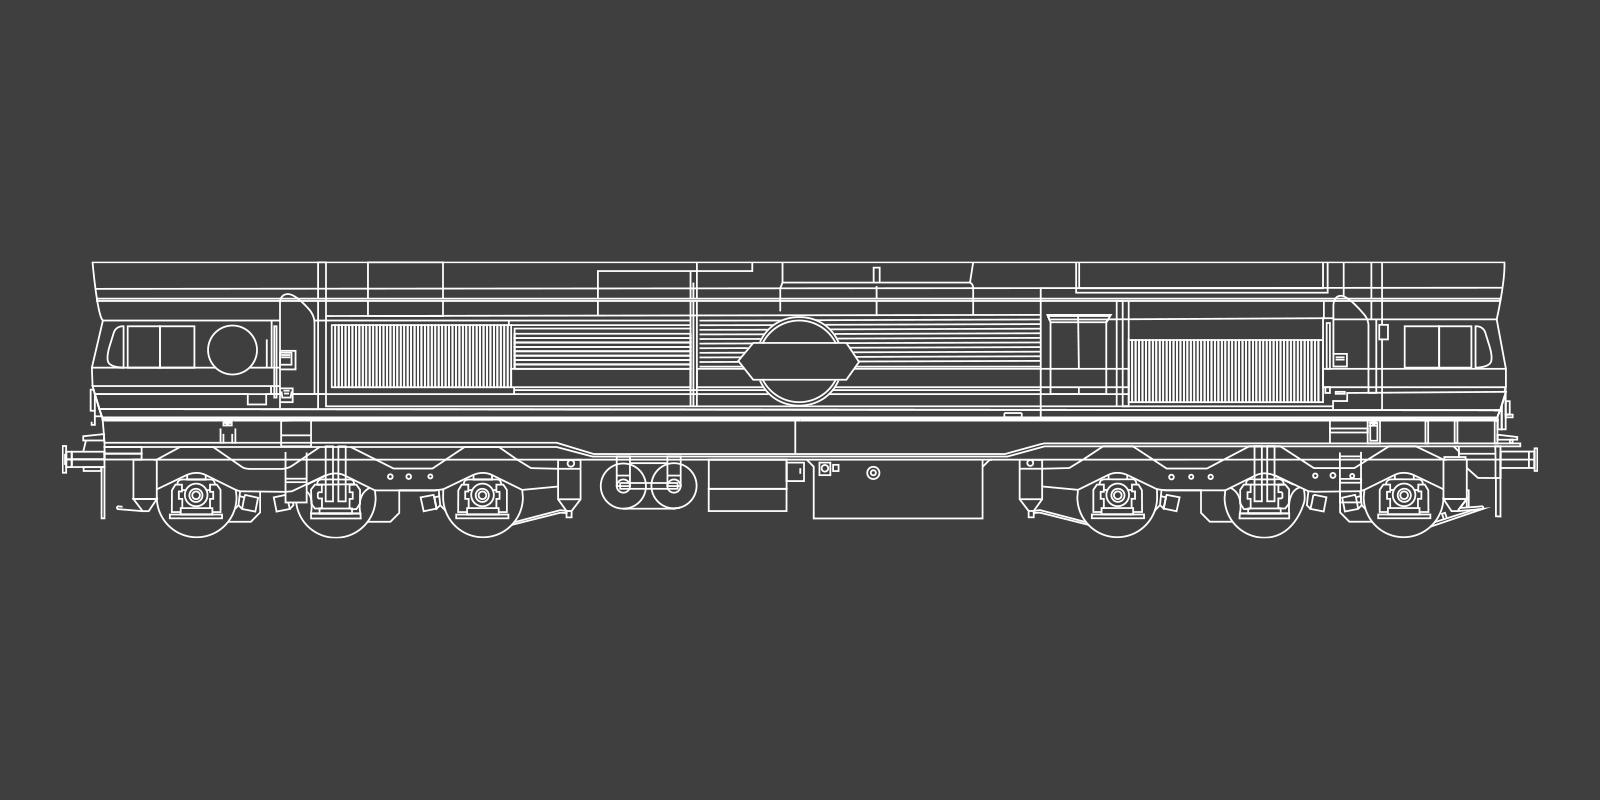 Class 59 Locomotive